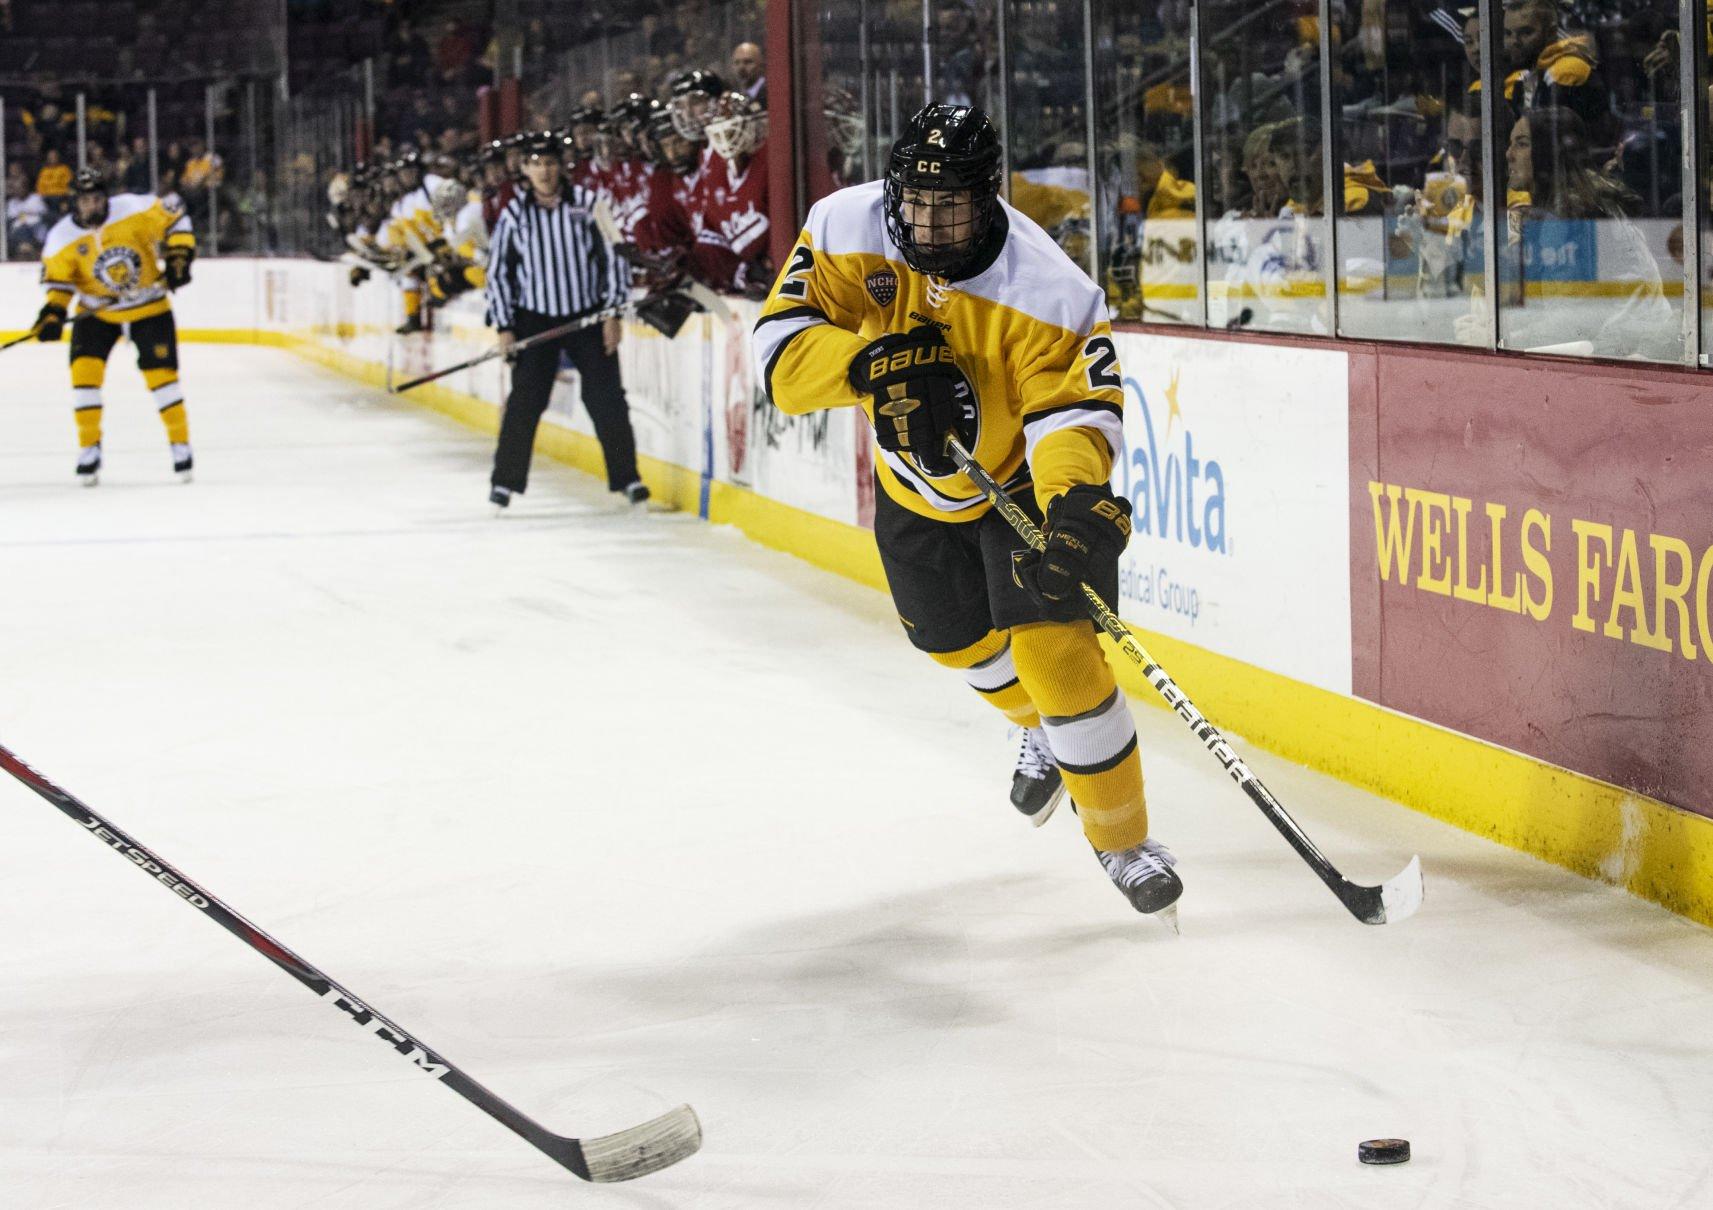 NCHC: Colorado College Hockey Pounces On Mavericks Early On Way To Win